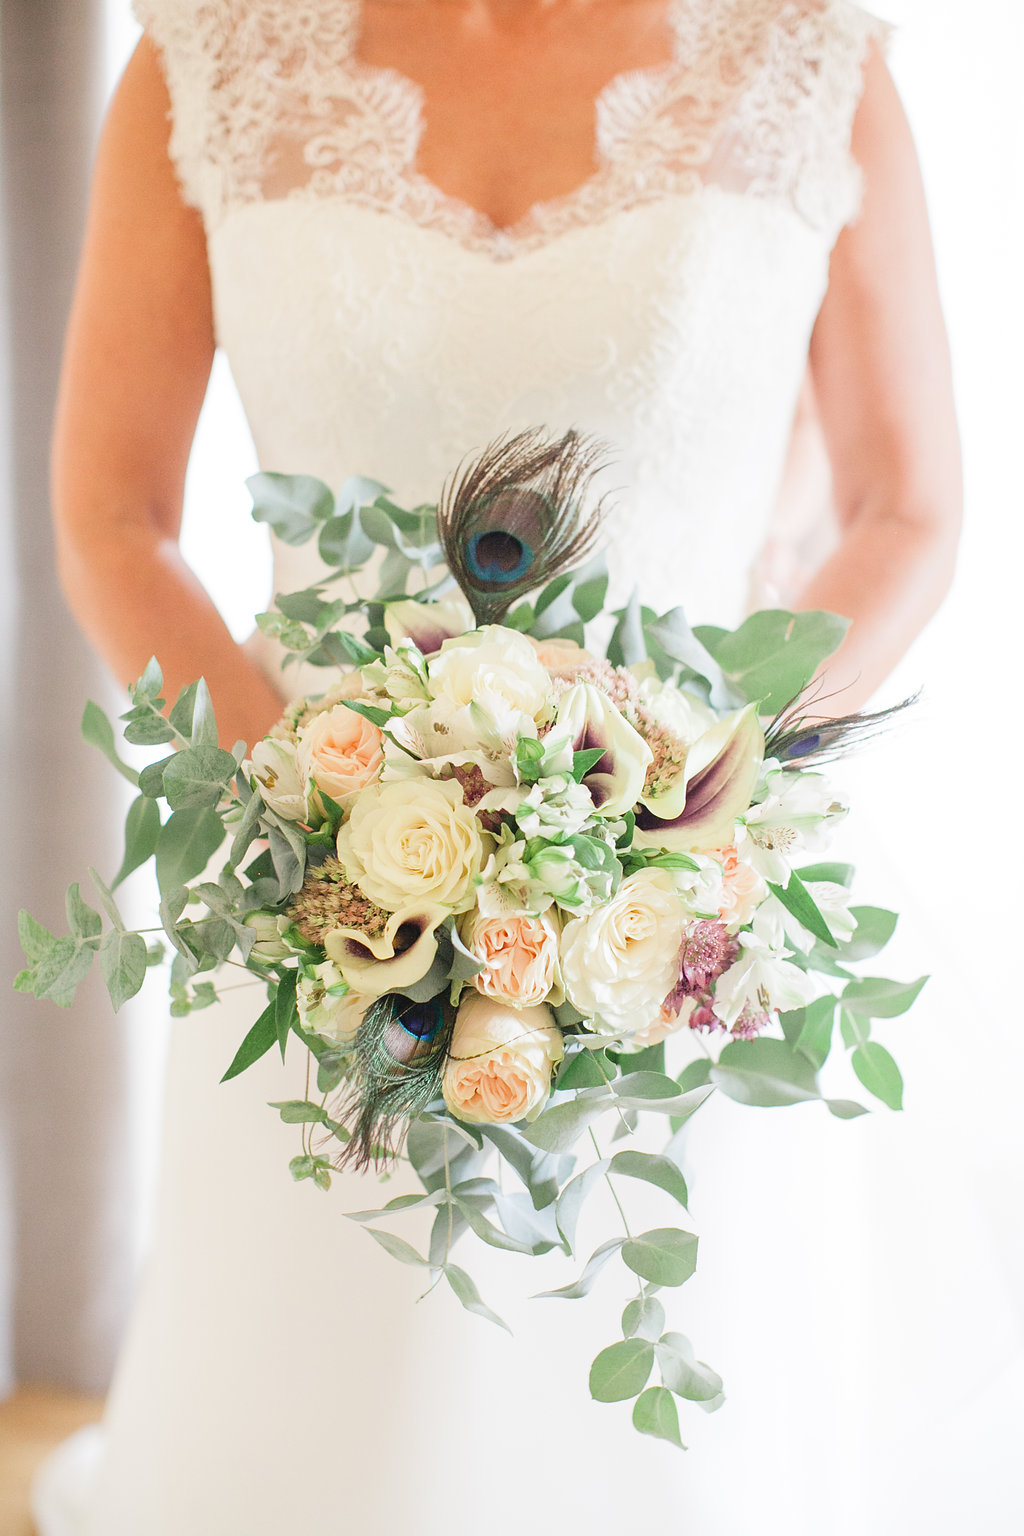 castelfalfi-tuscany-wedding-photographer-roberta-facchini-94